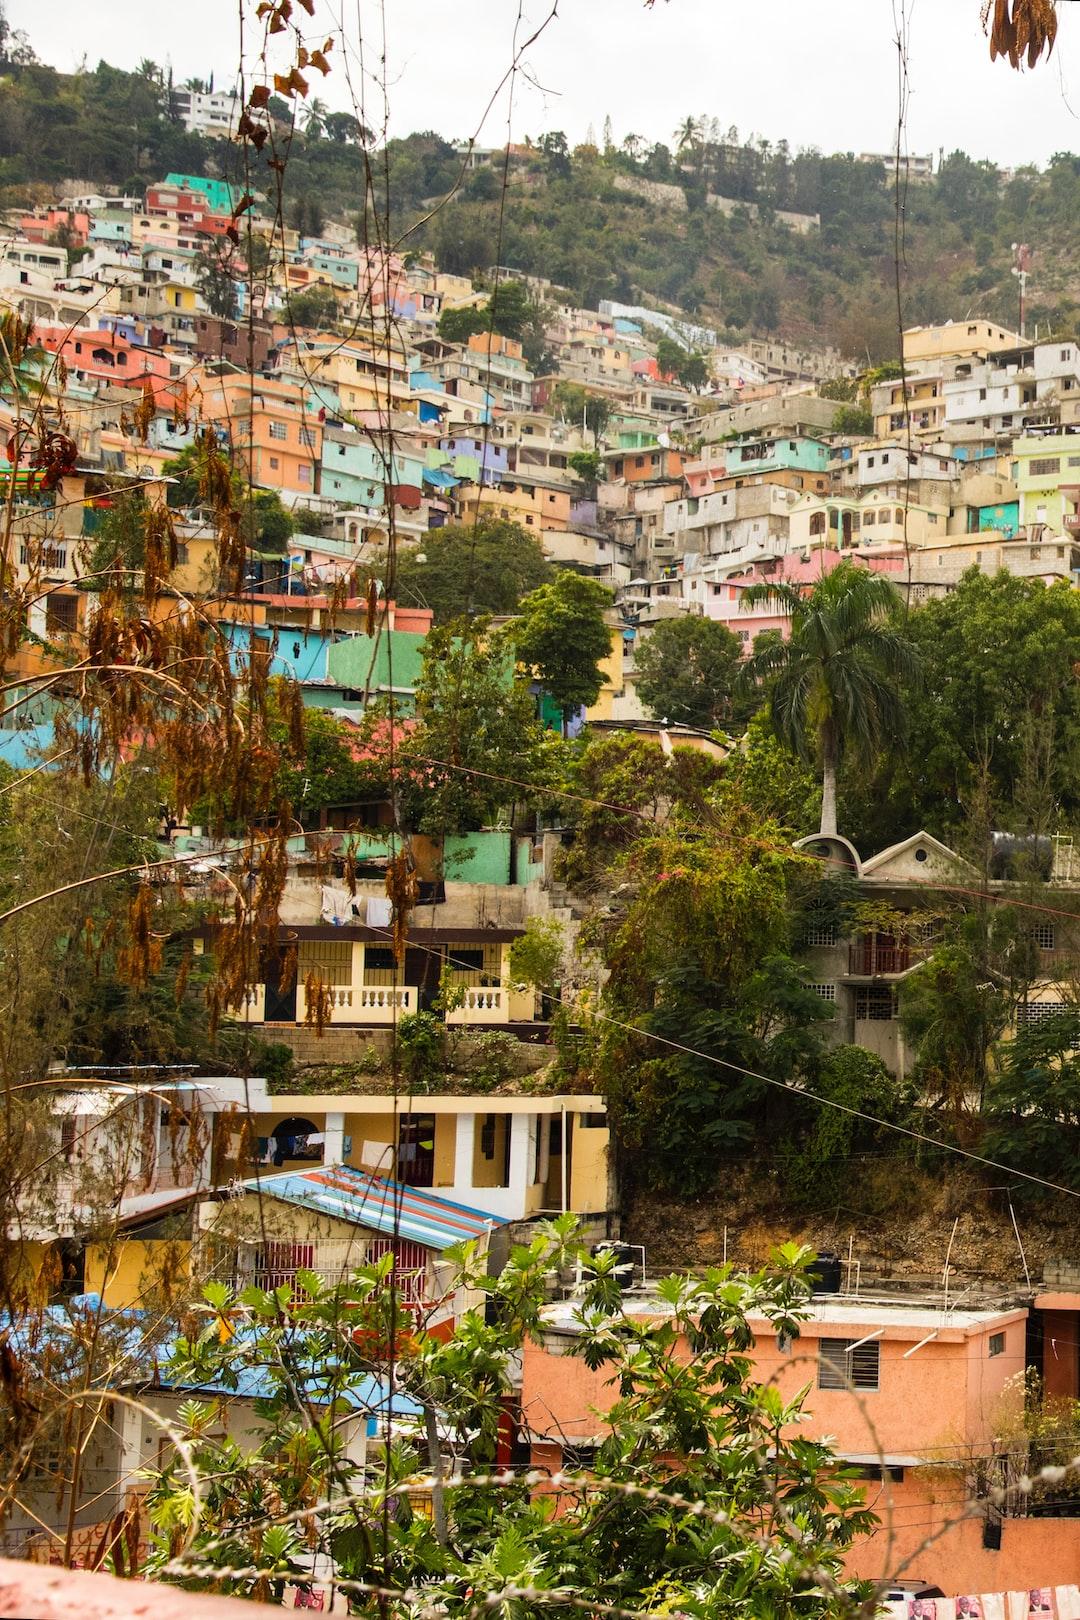 Coastal Hillside - Haiti